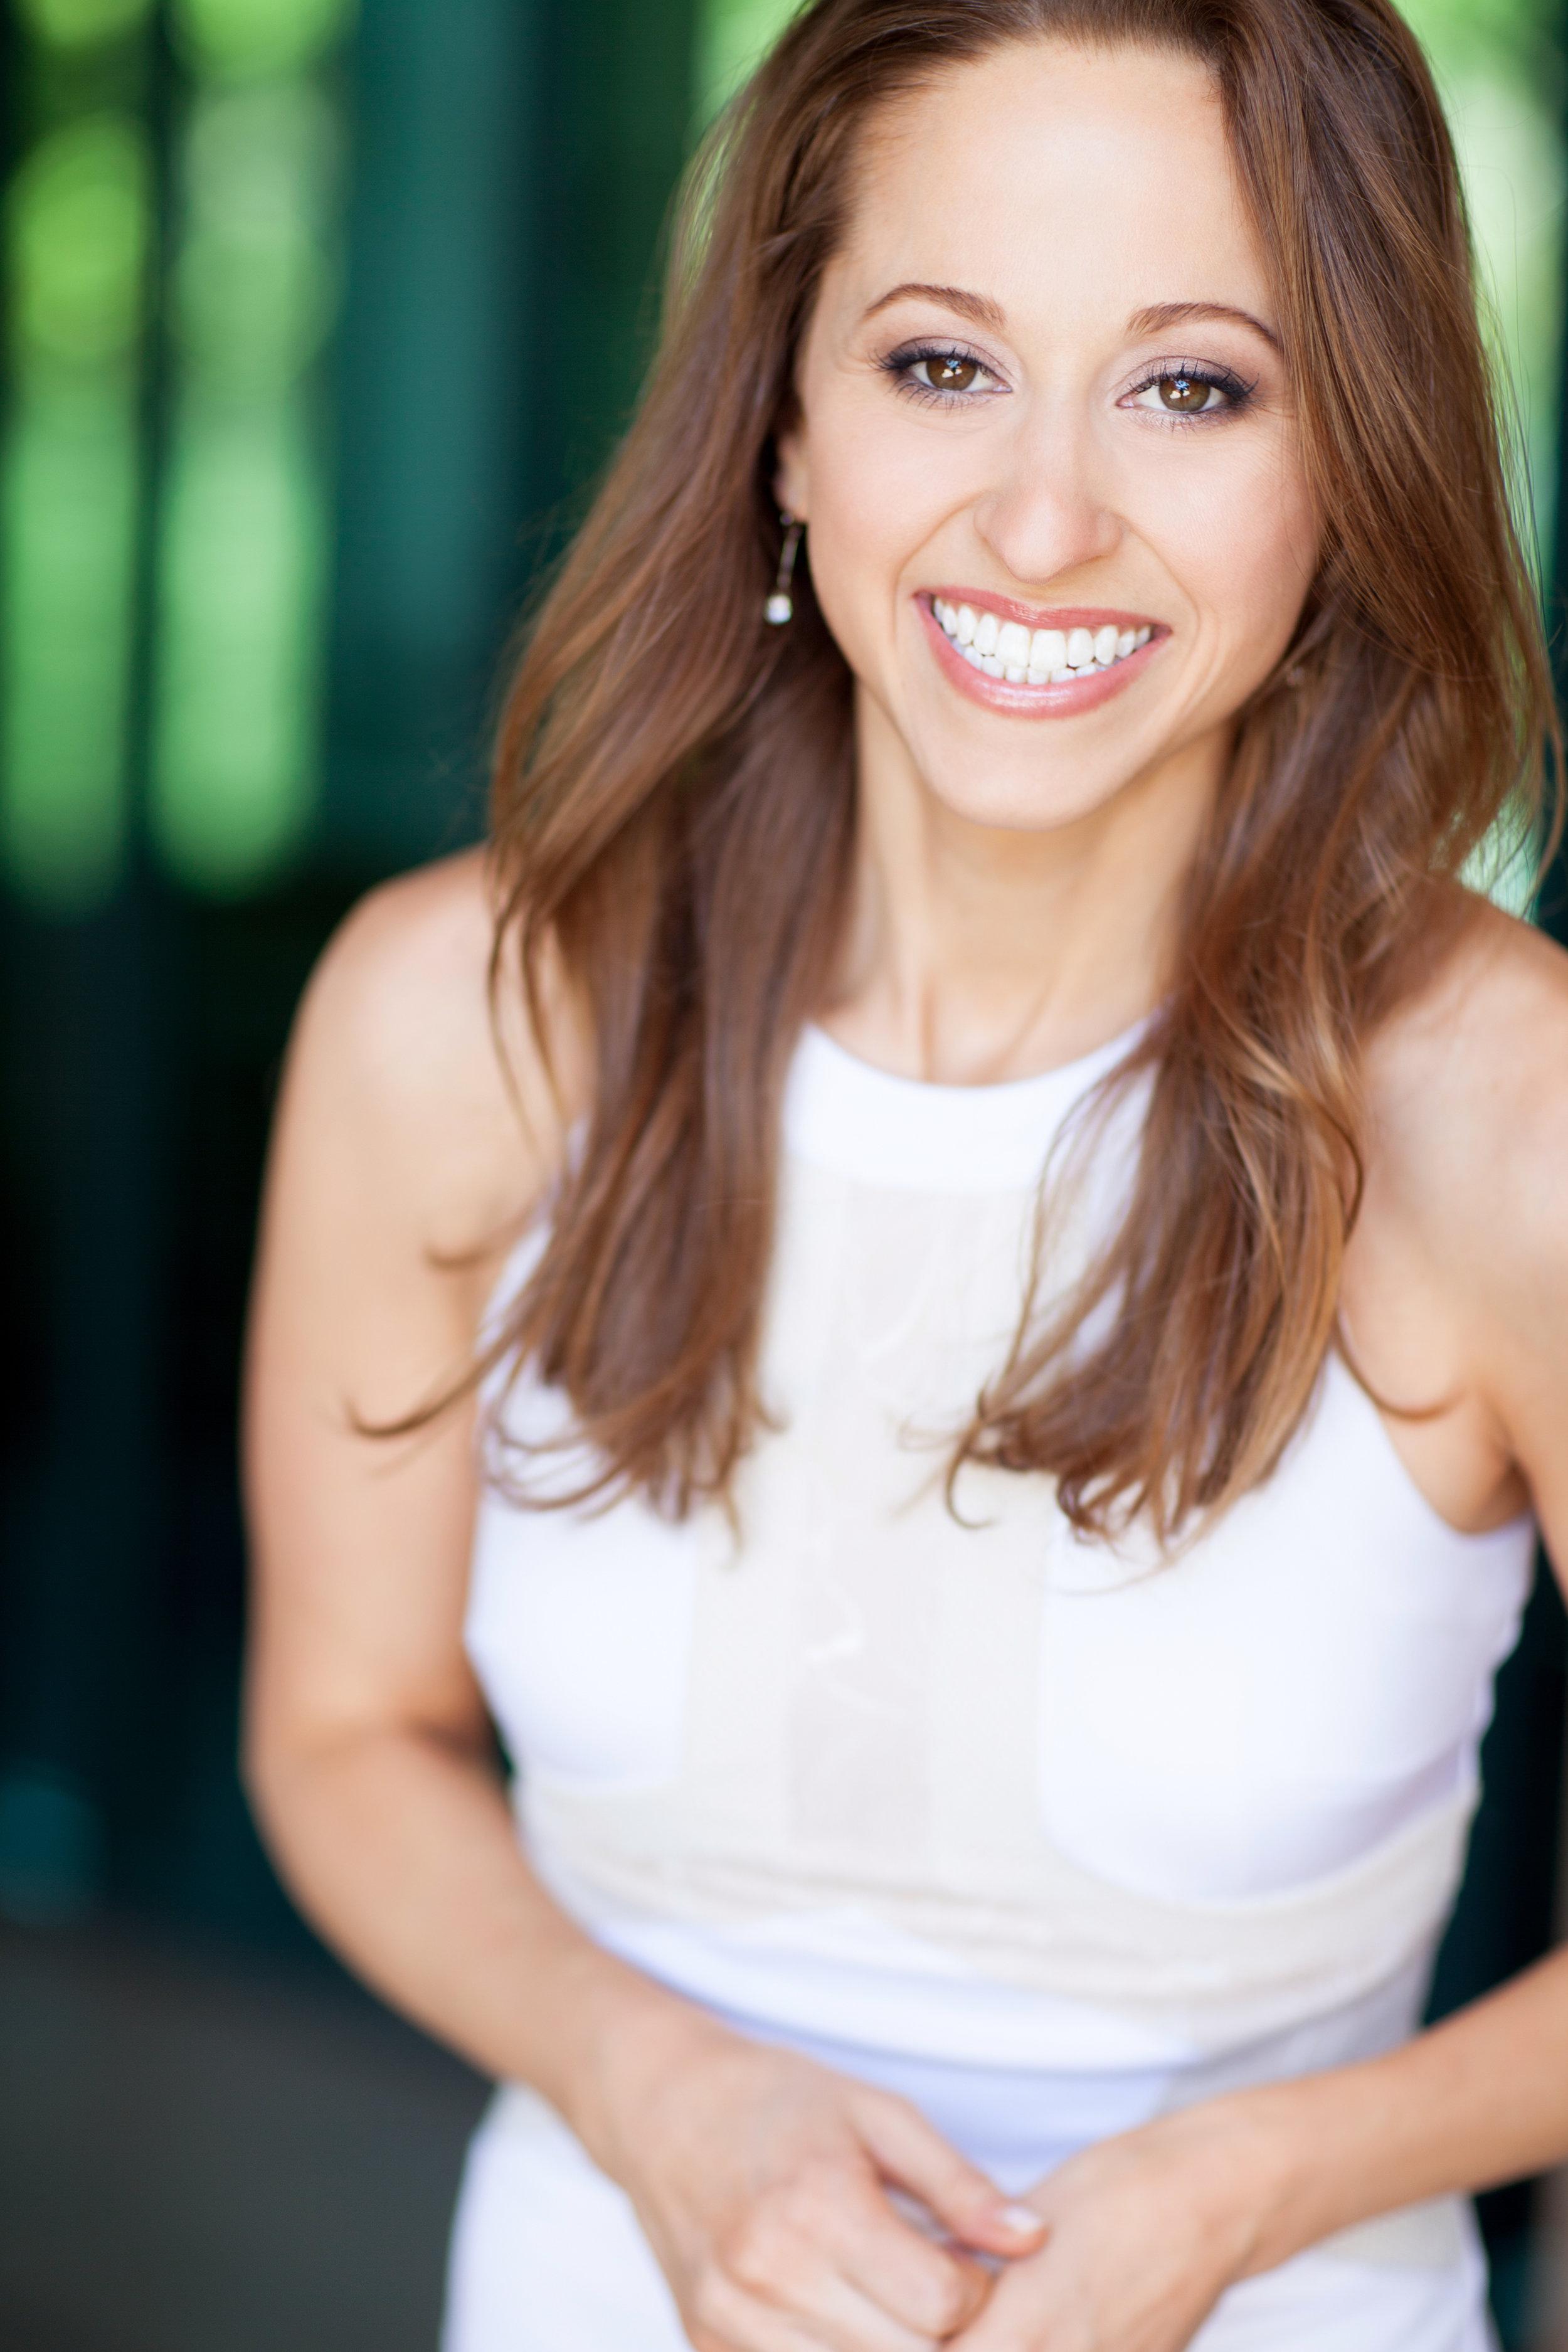 ERICA MANDY  Founder & Host of theNewsWorthy